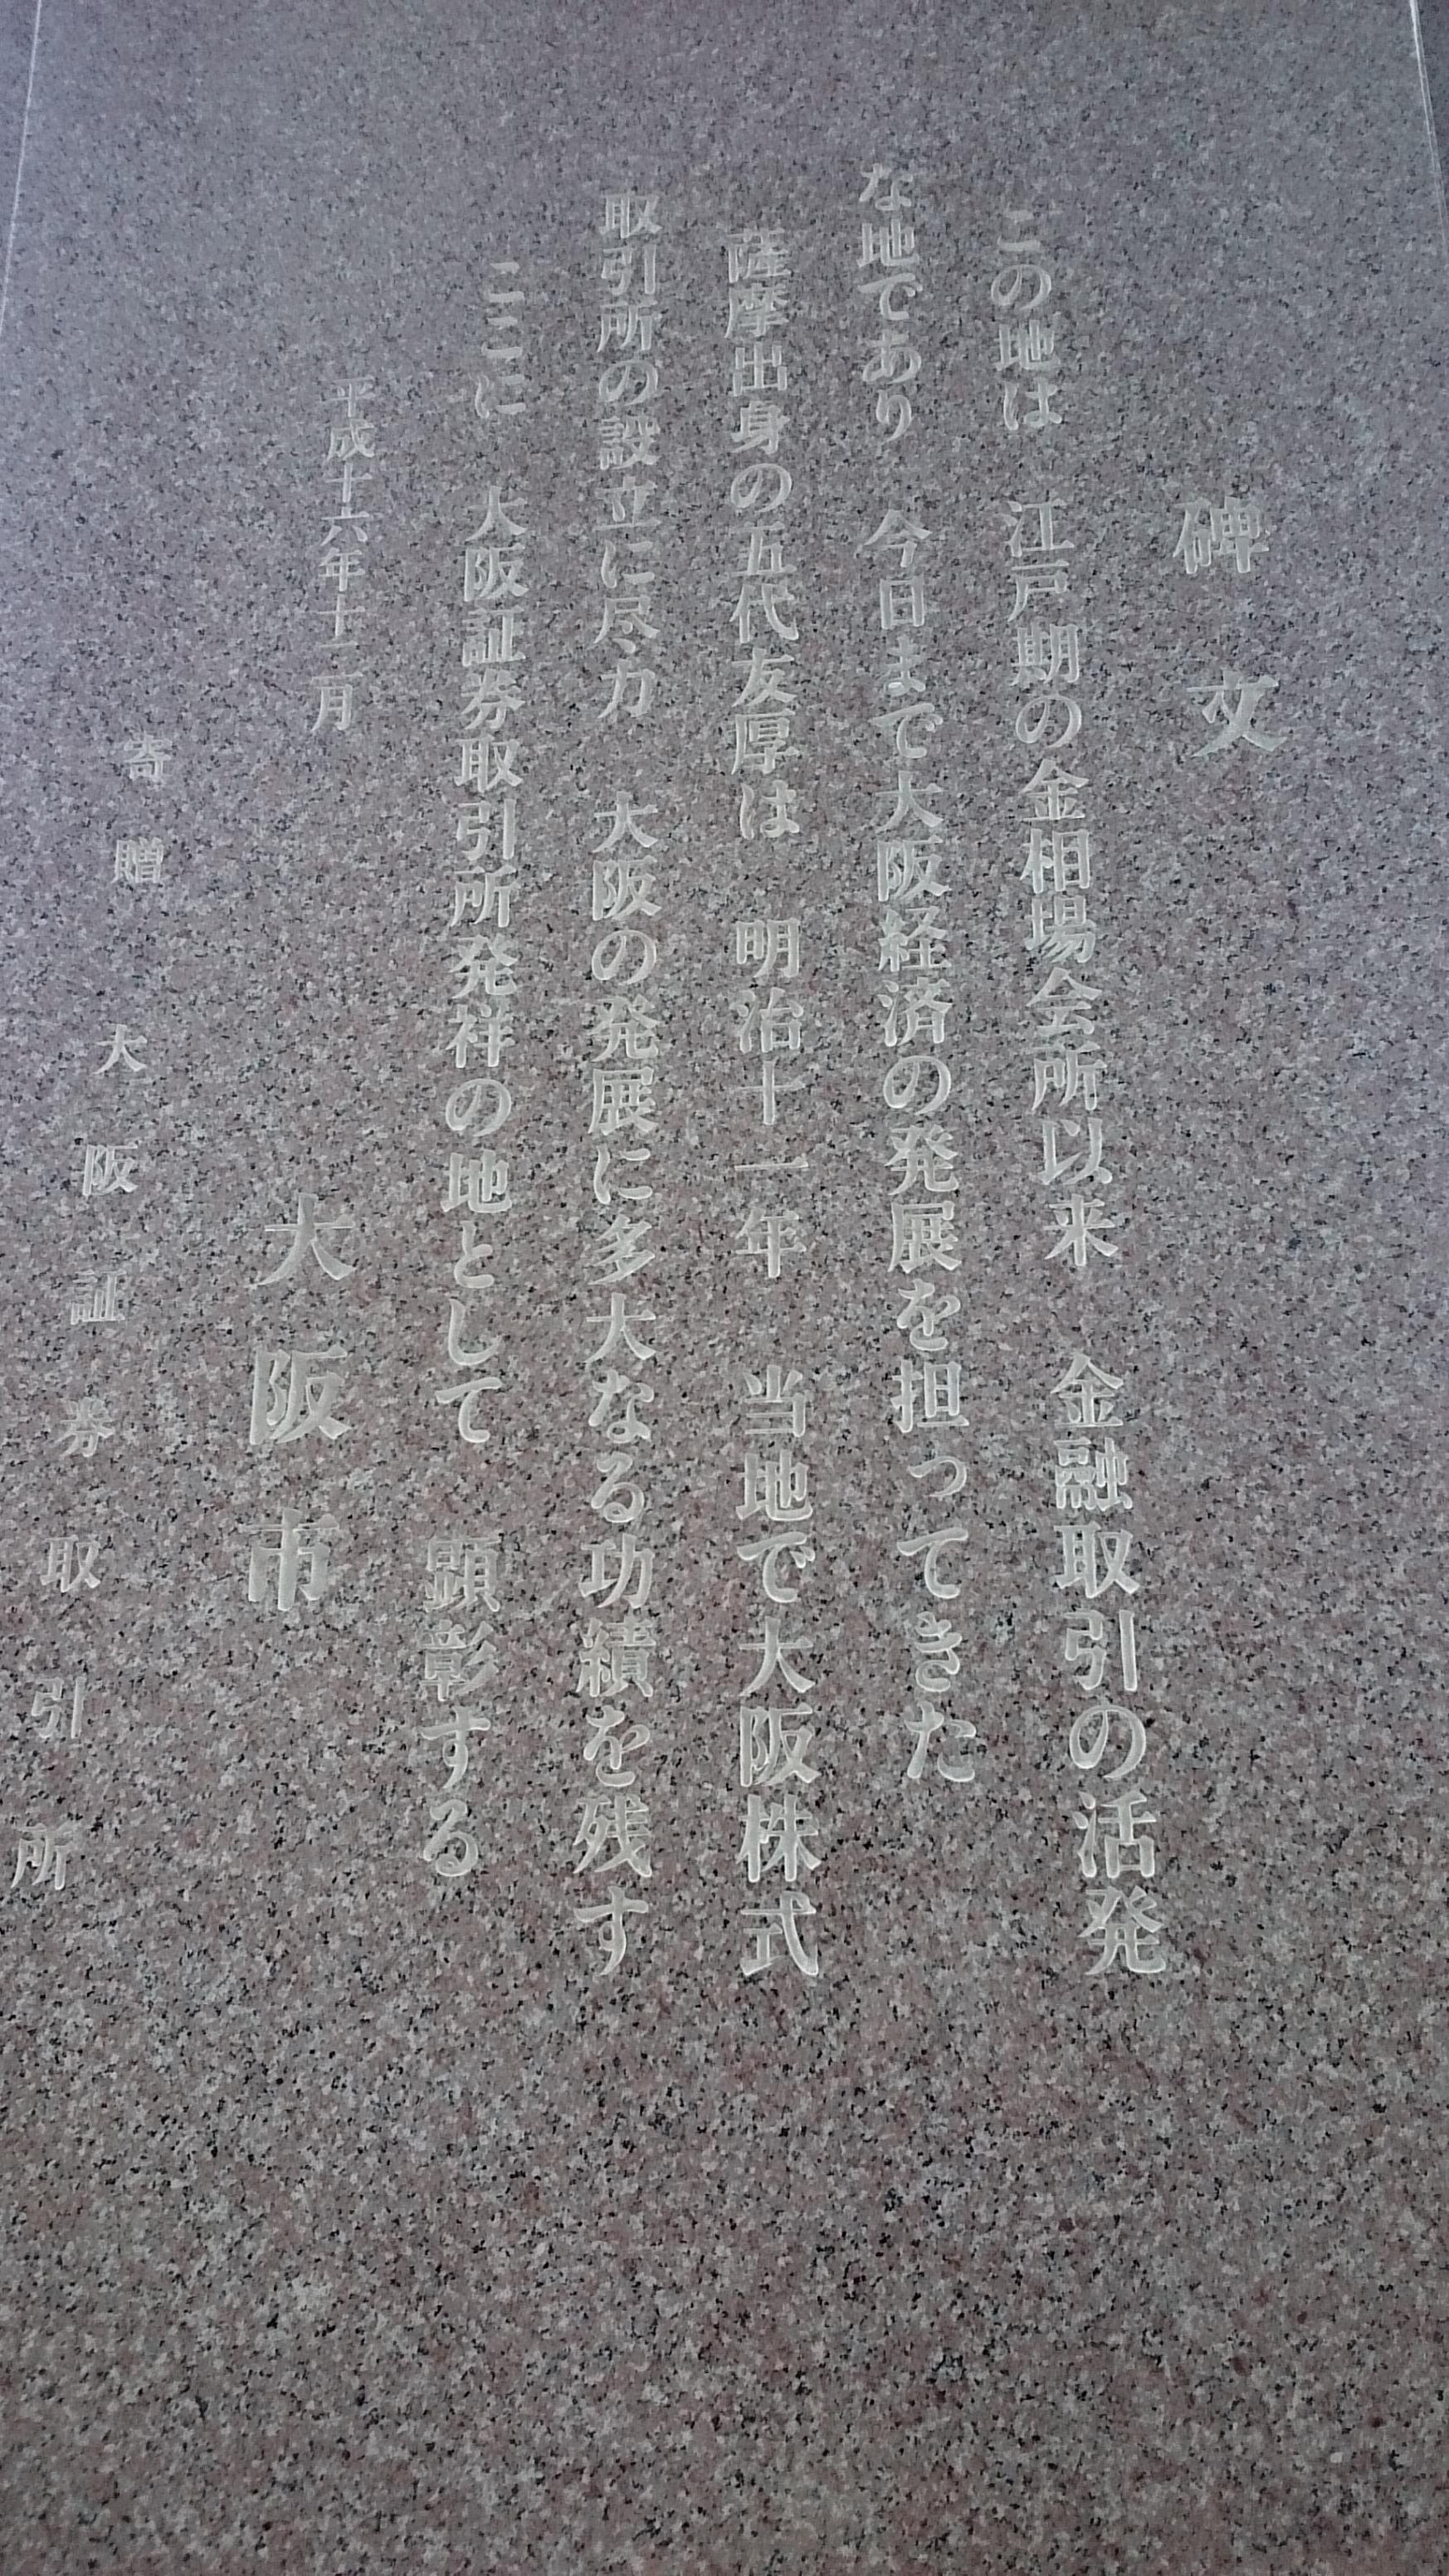 DSC_3715.jpg